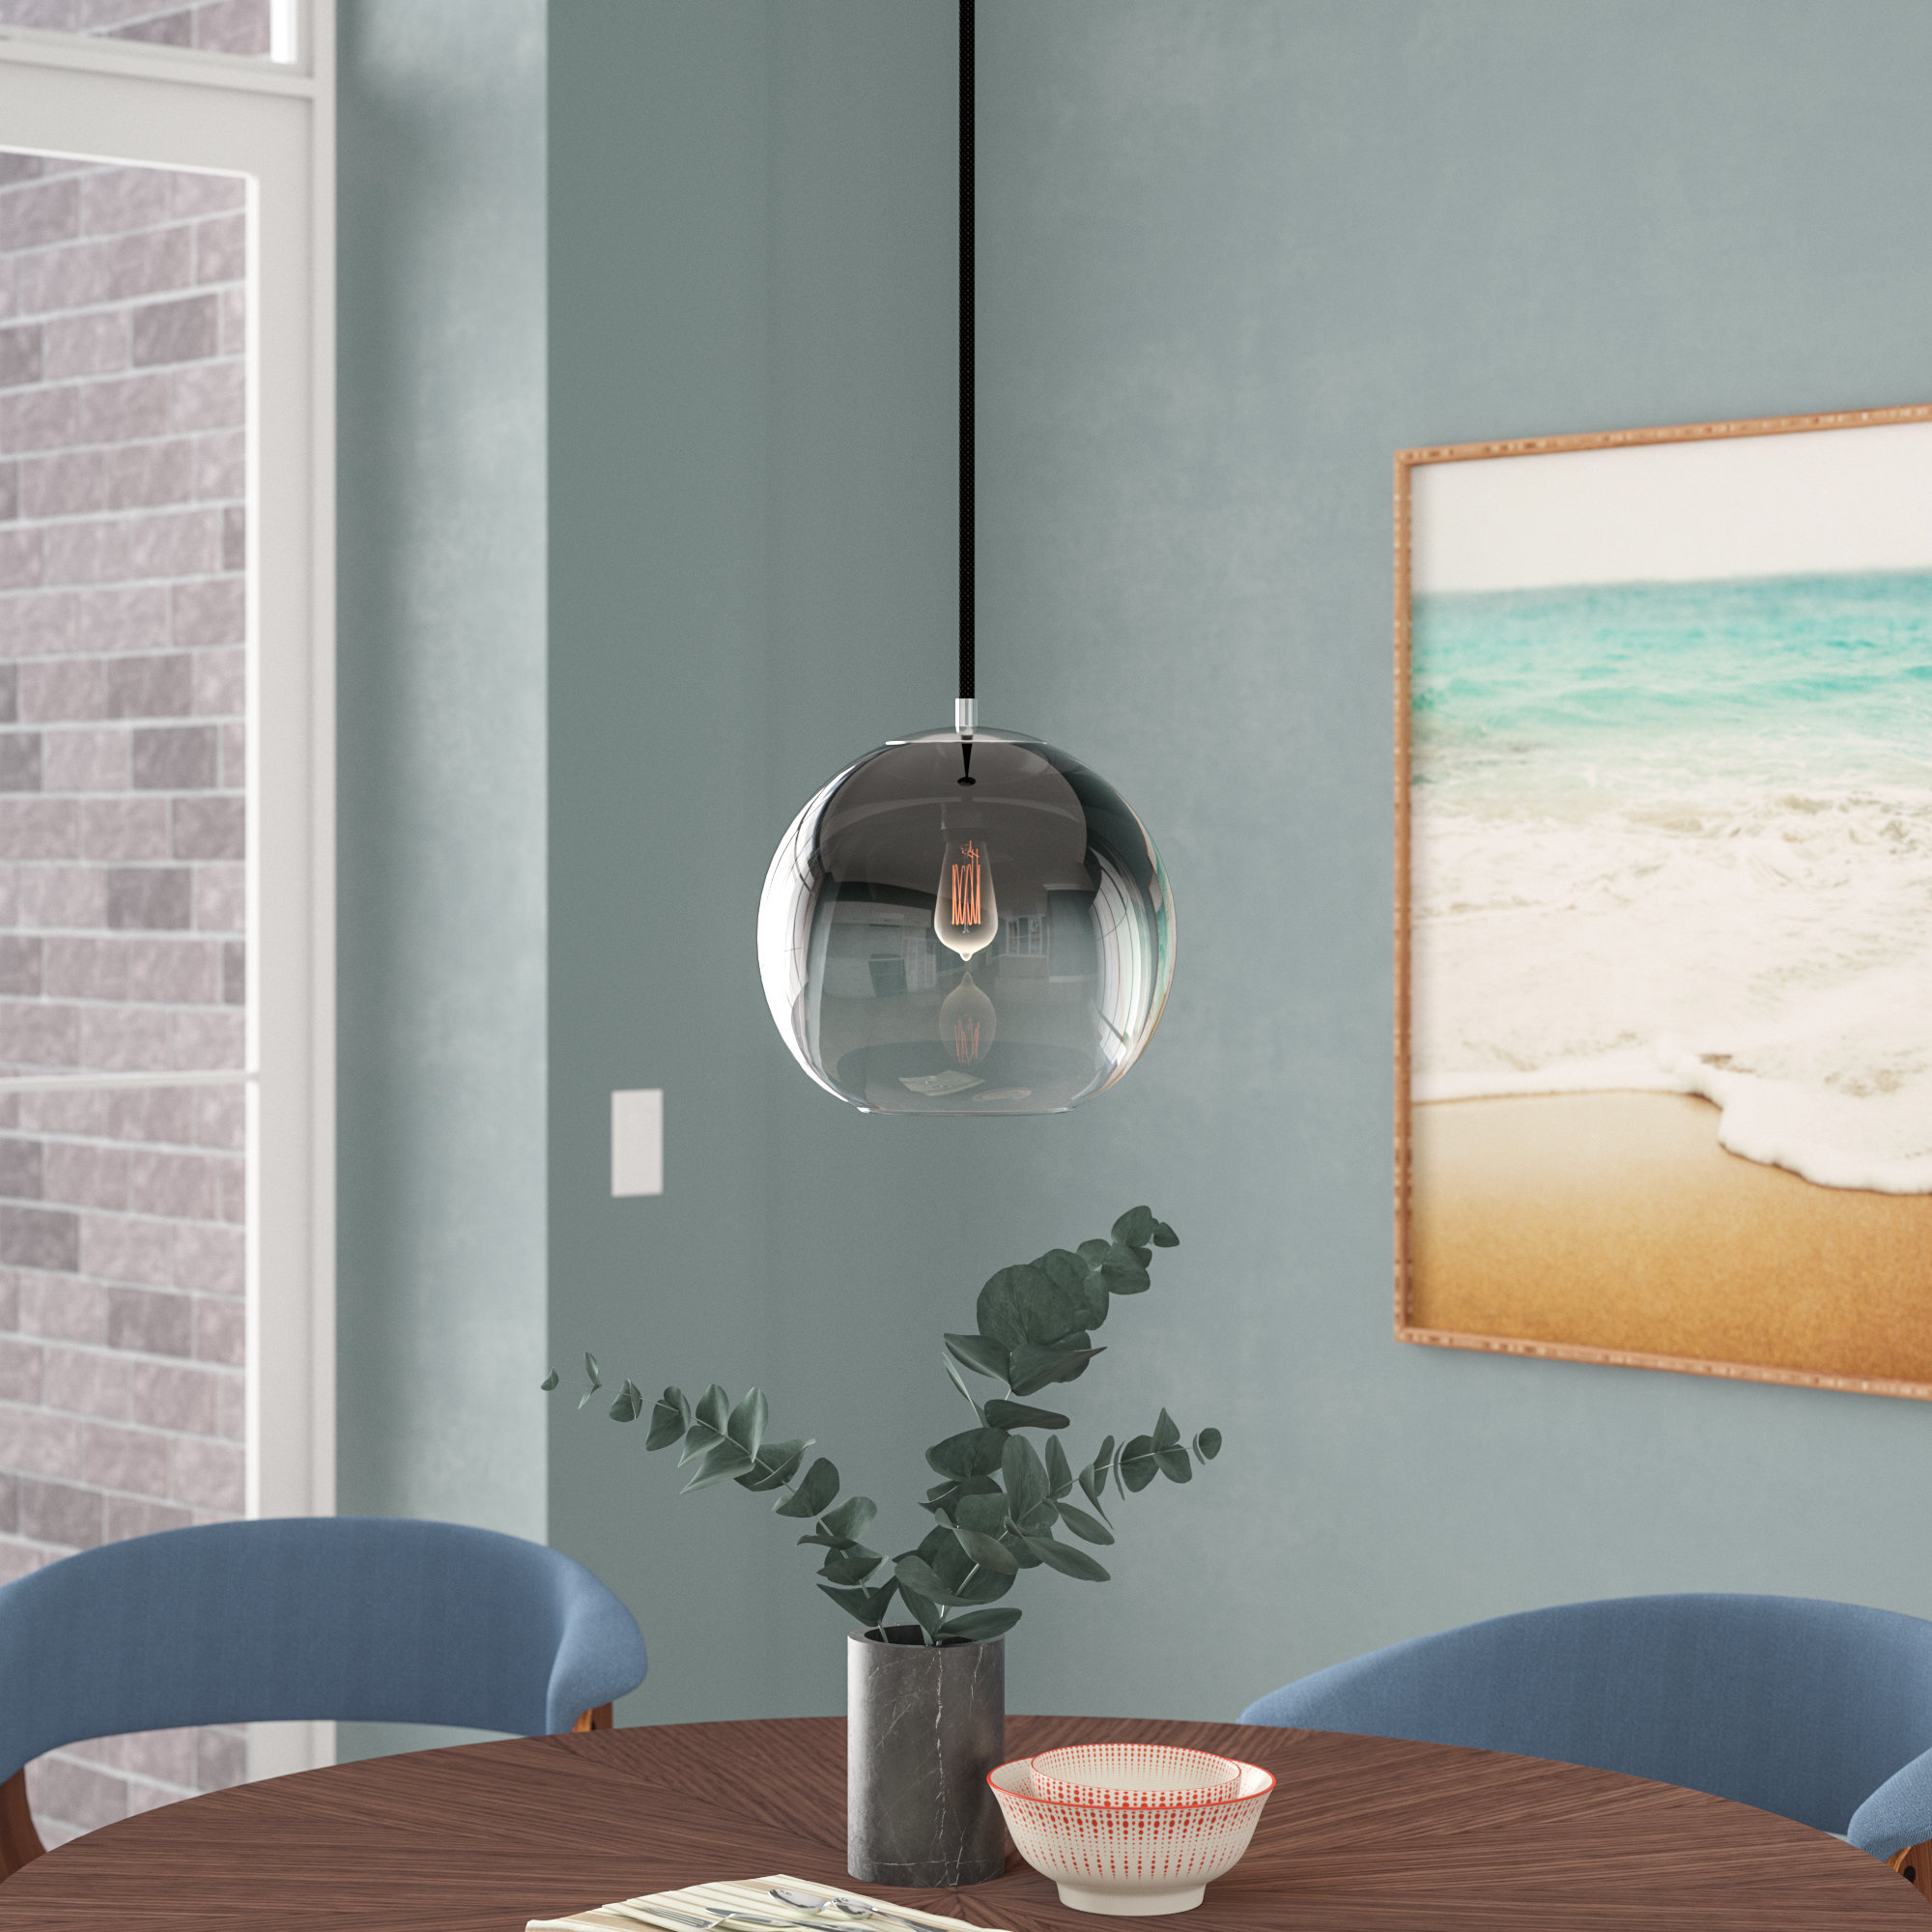 "Globe Mini (less Than 10"" Wide) Pendant Lighting You'll Love Intended For Devereaux 1 Light Single Globe Pendants (View 24 of 30)"